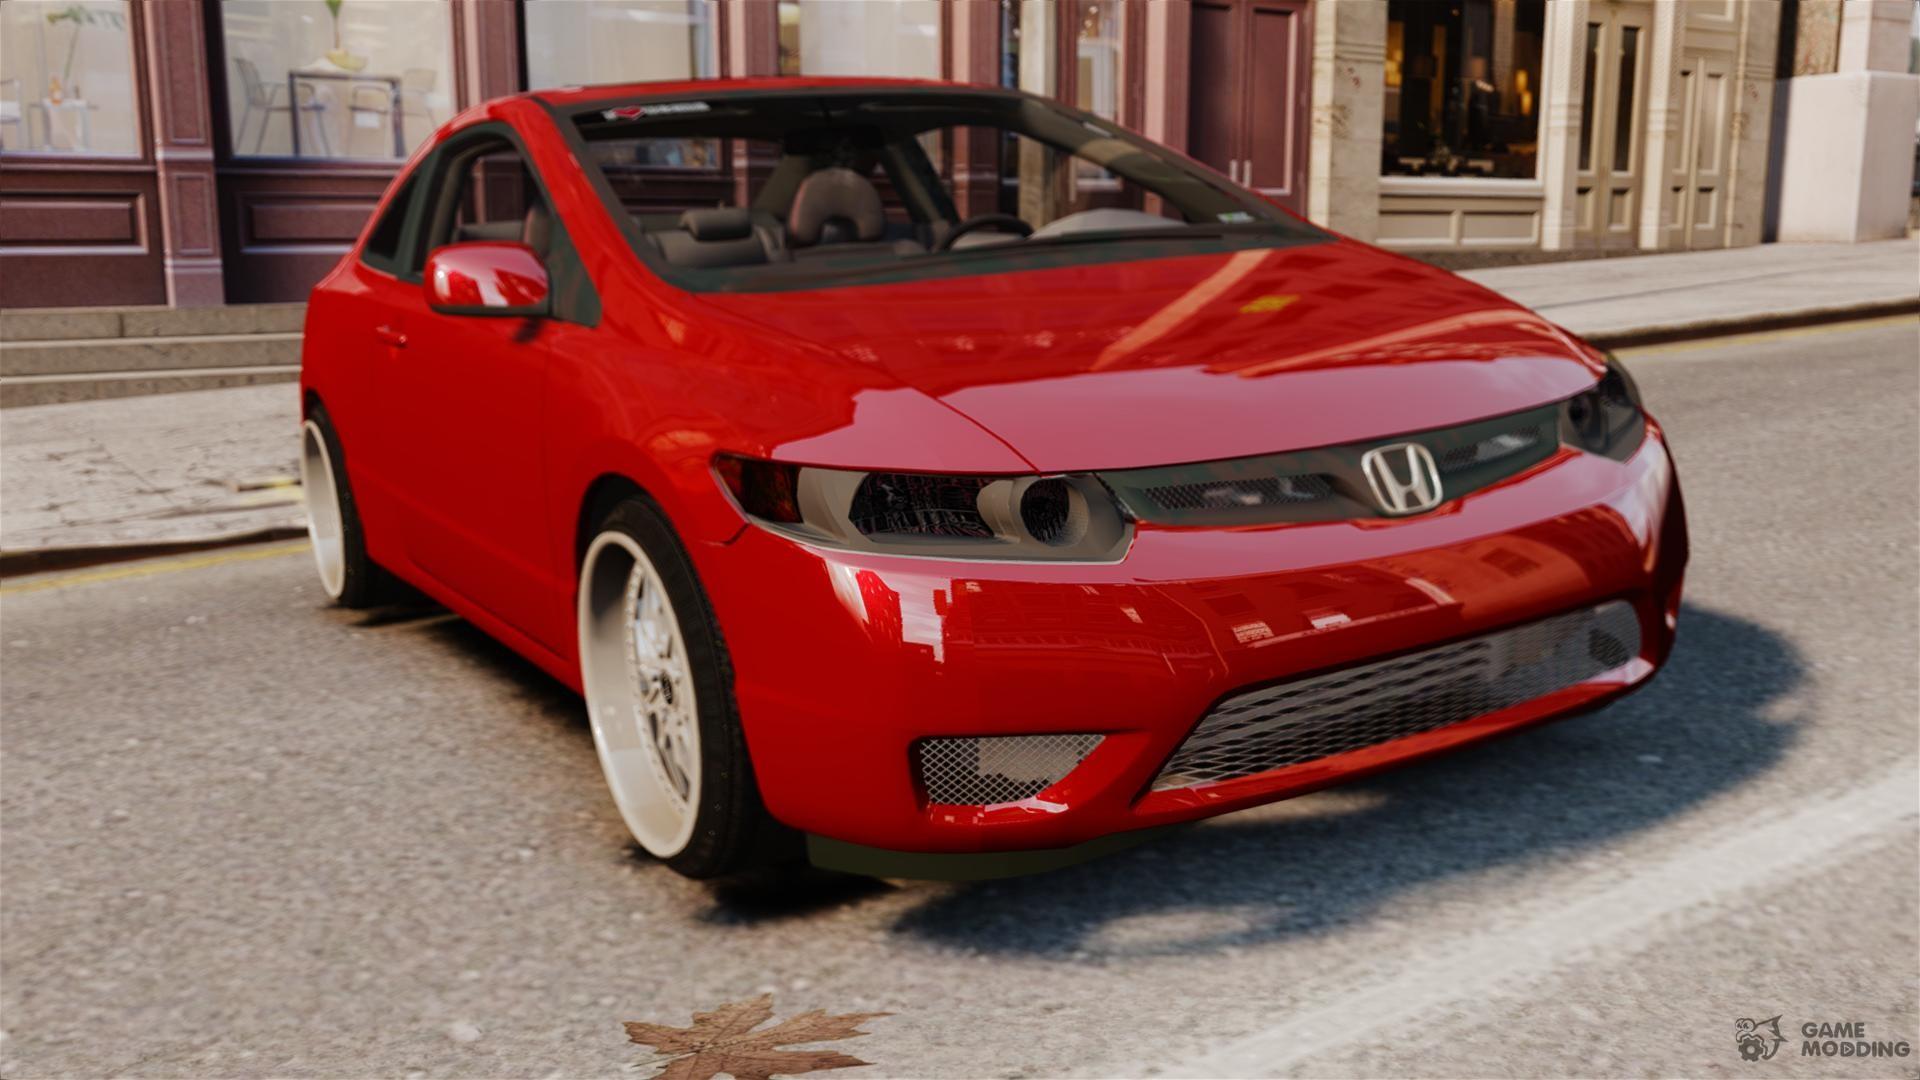 Honda Civic tranny en gta